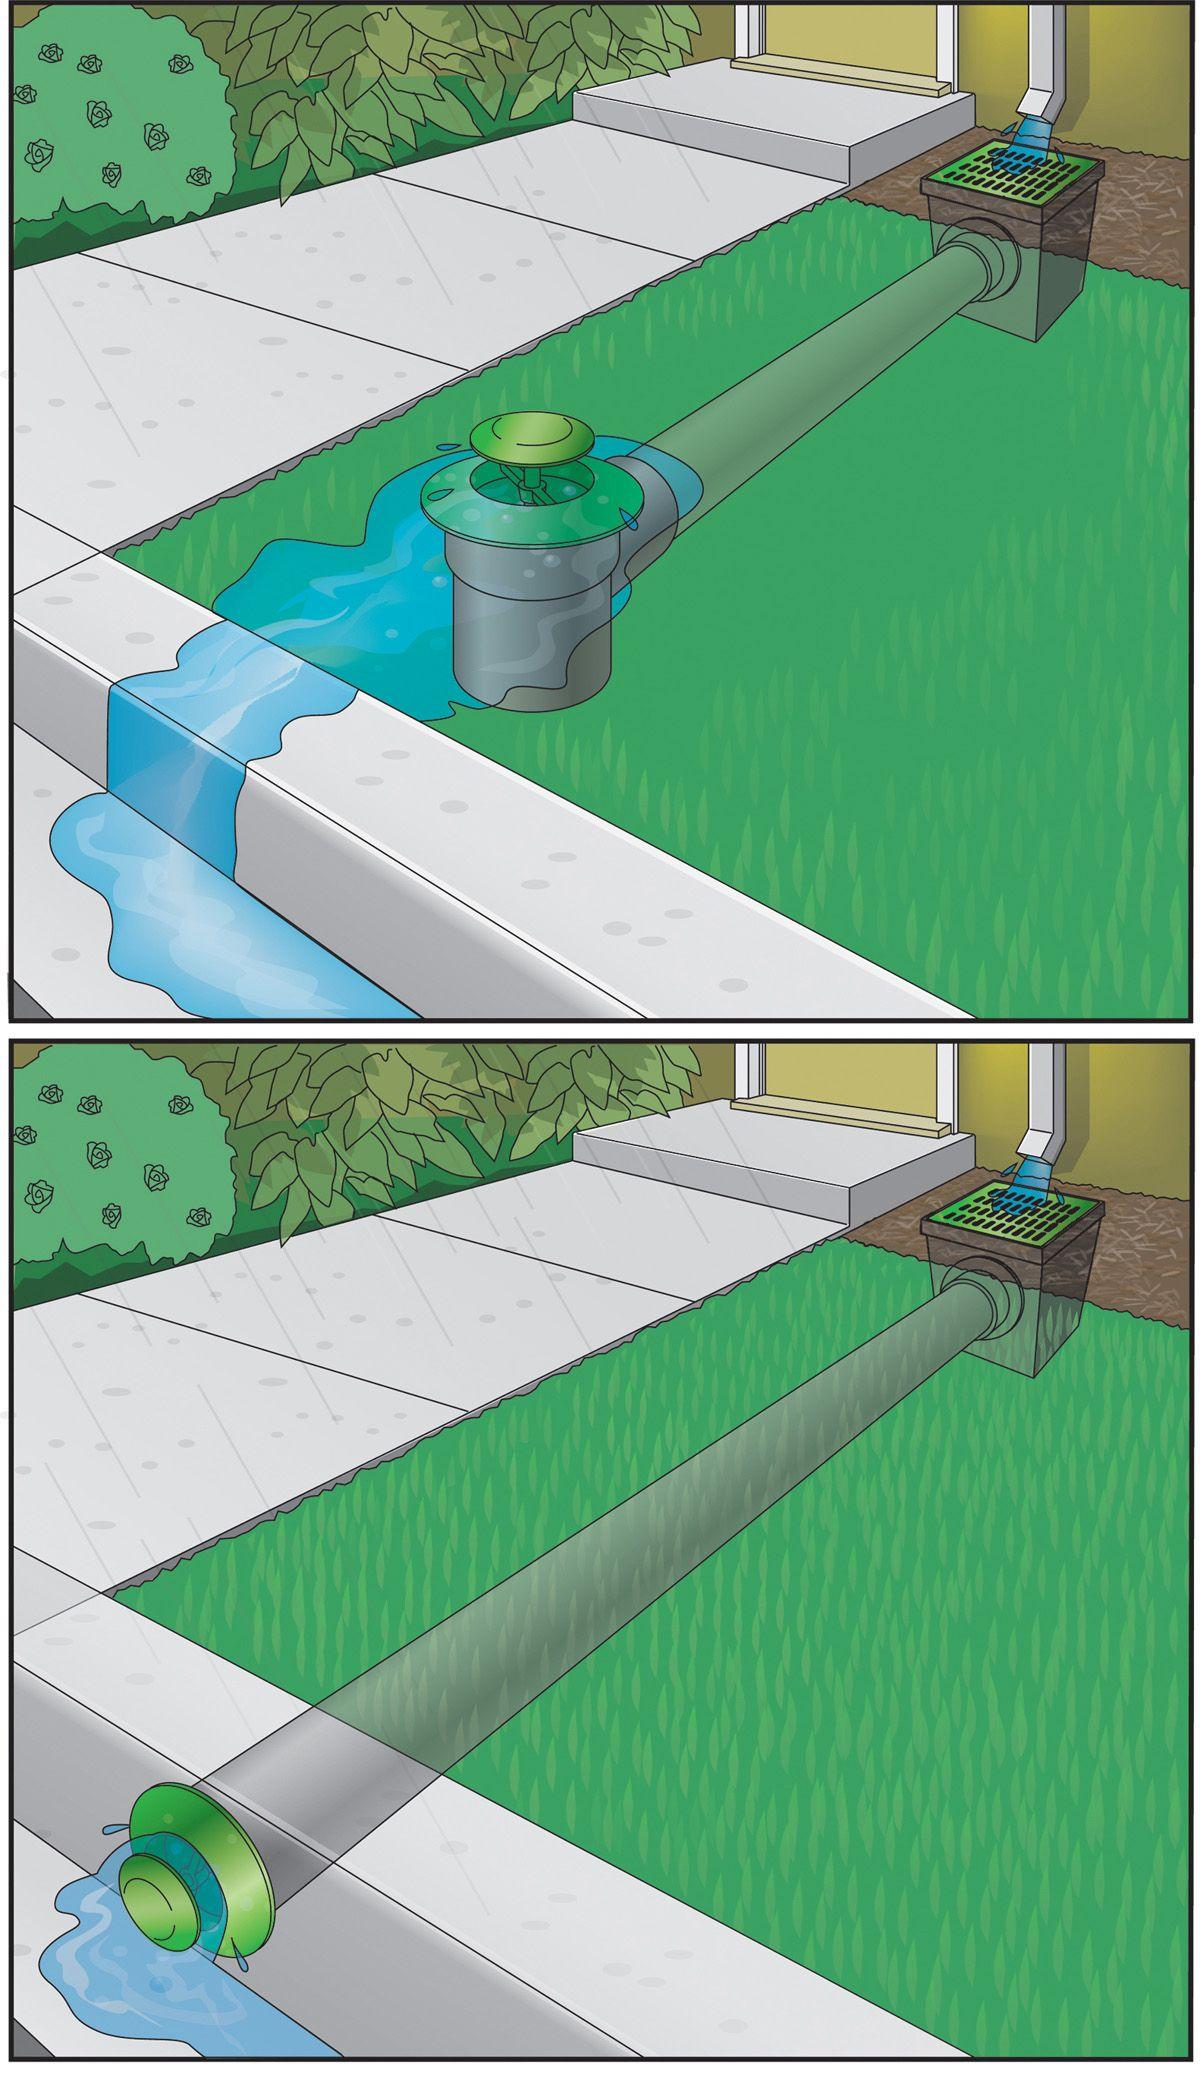 sump pump basins extension | Backyard drainage, Yard ...